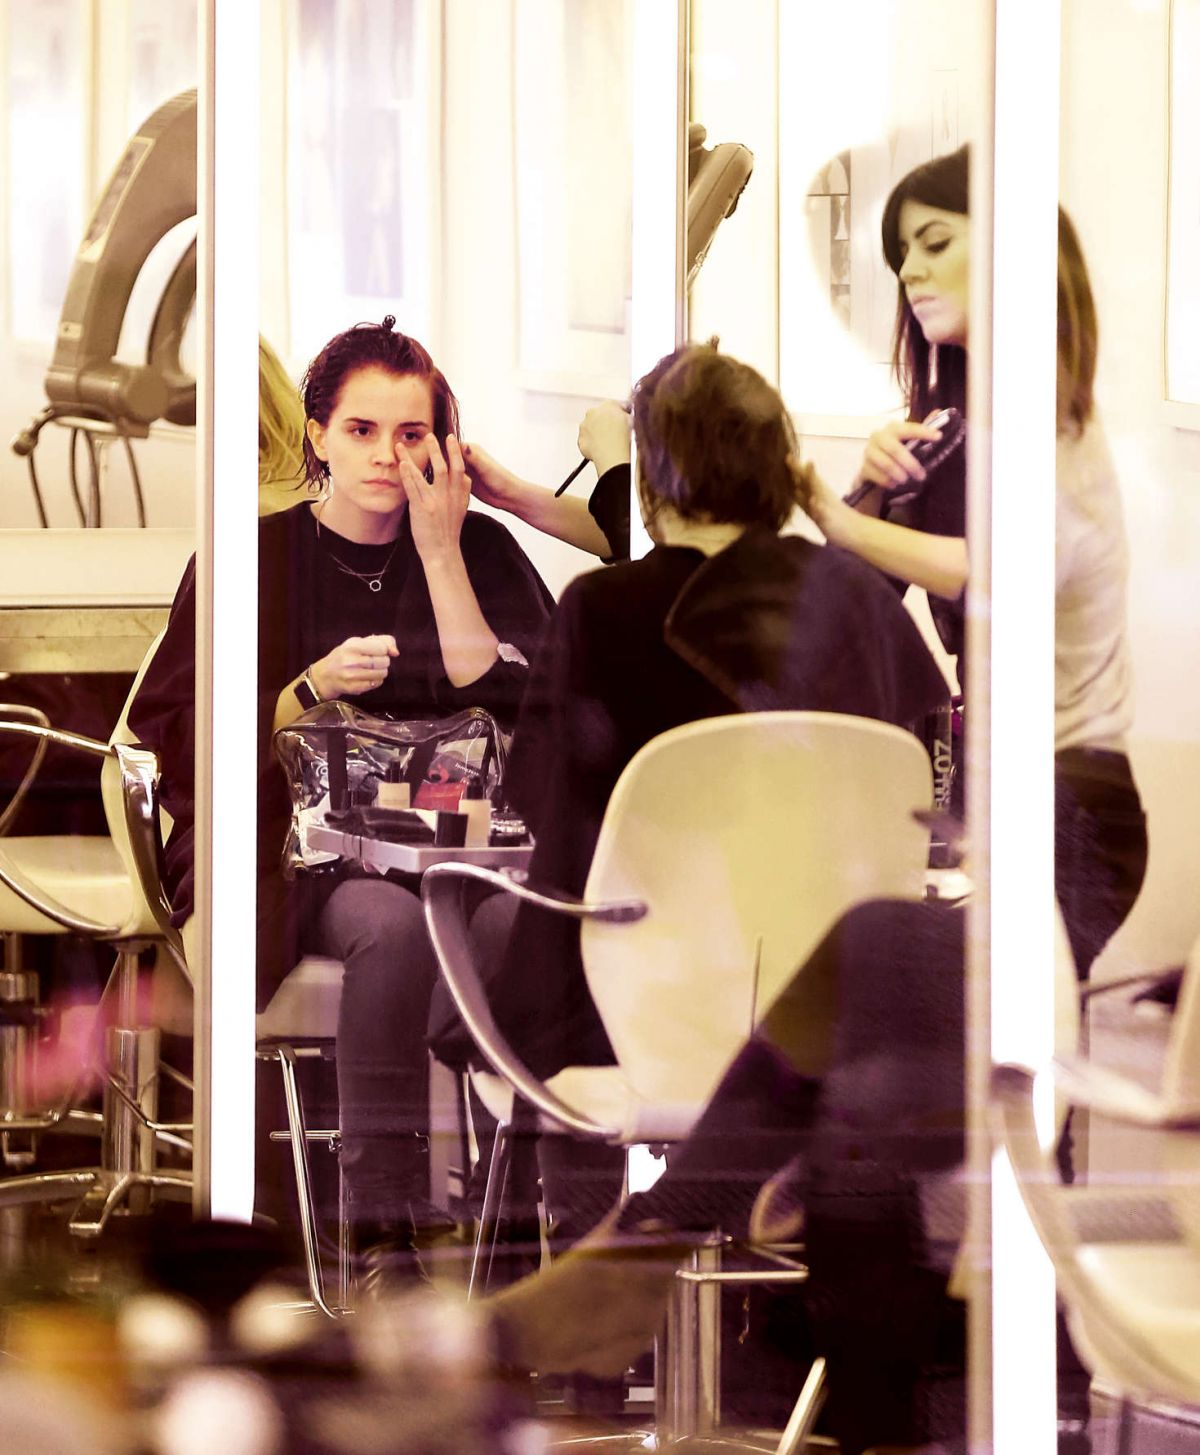 Salon Style New Yorkais emma-watson-at-a-hair-salon-in-new-york-12-08-2015_2